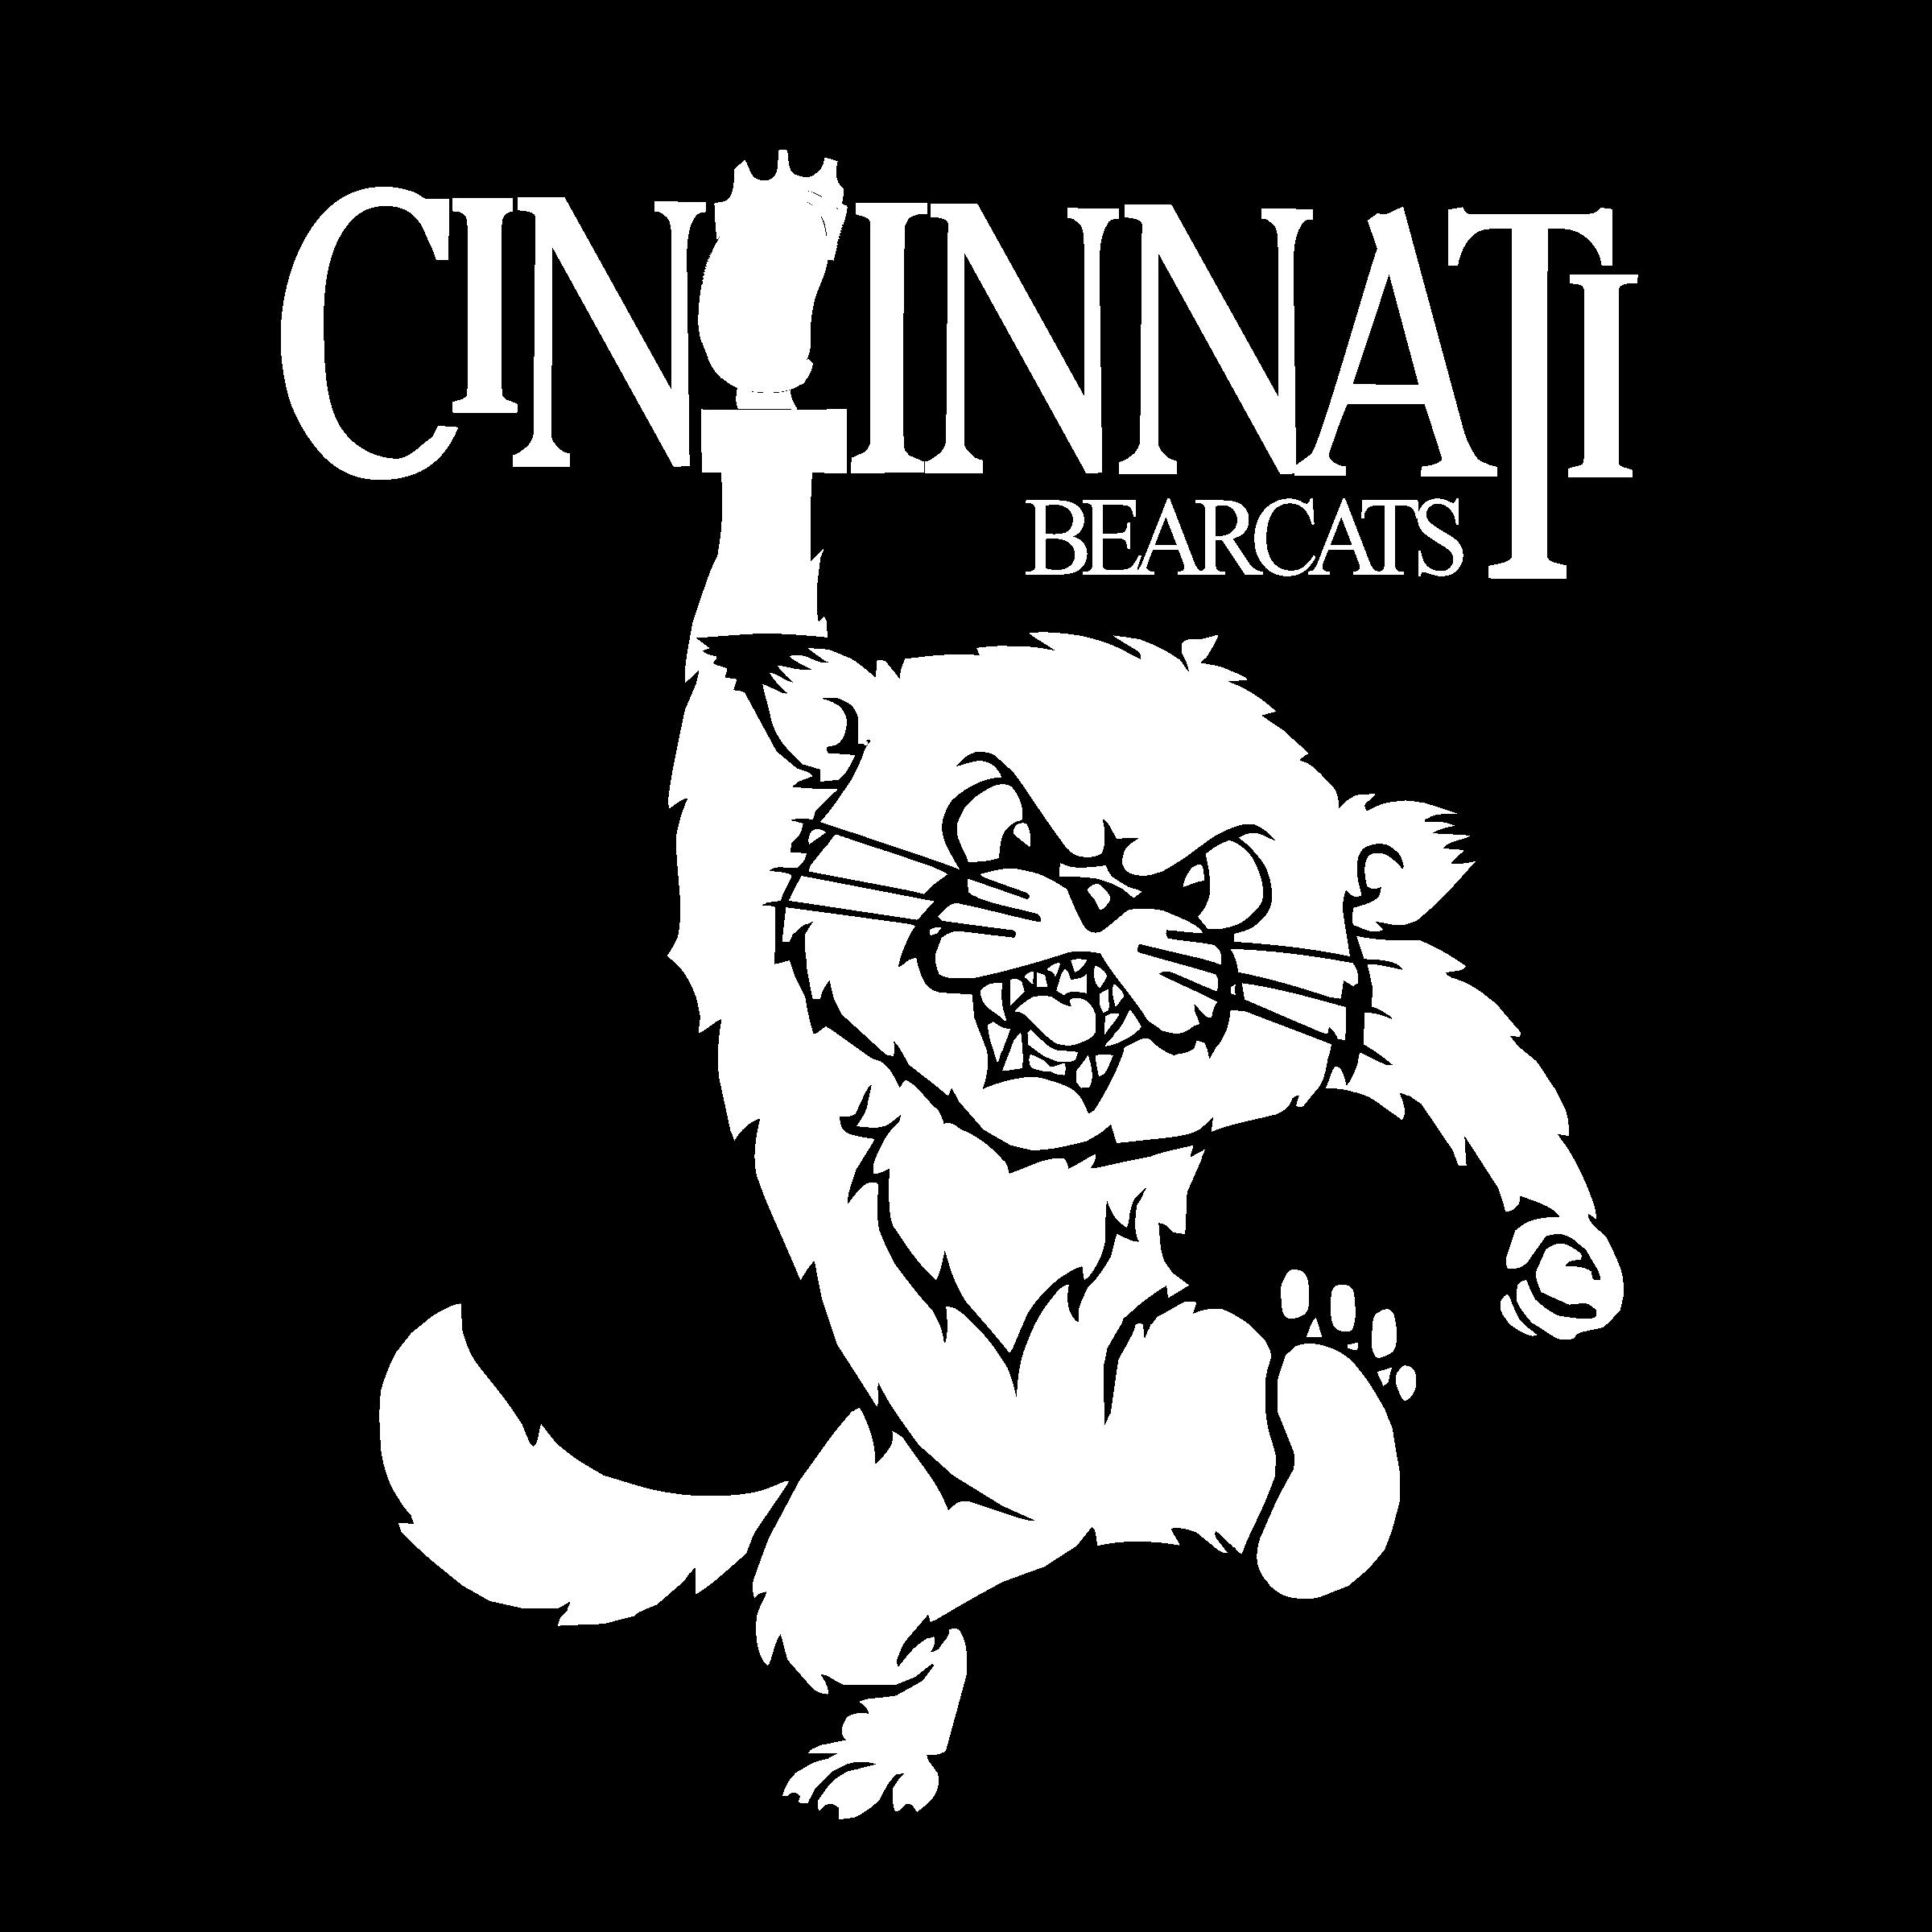 Cincinnati Bearcats Logo Png Transparent Svg Vector Freebie Supply